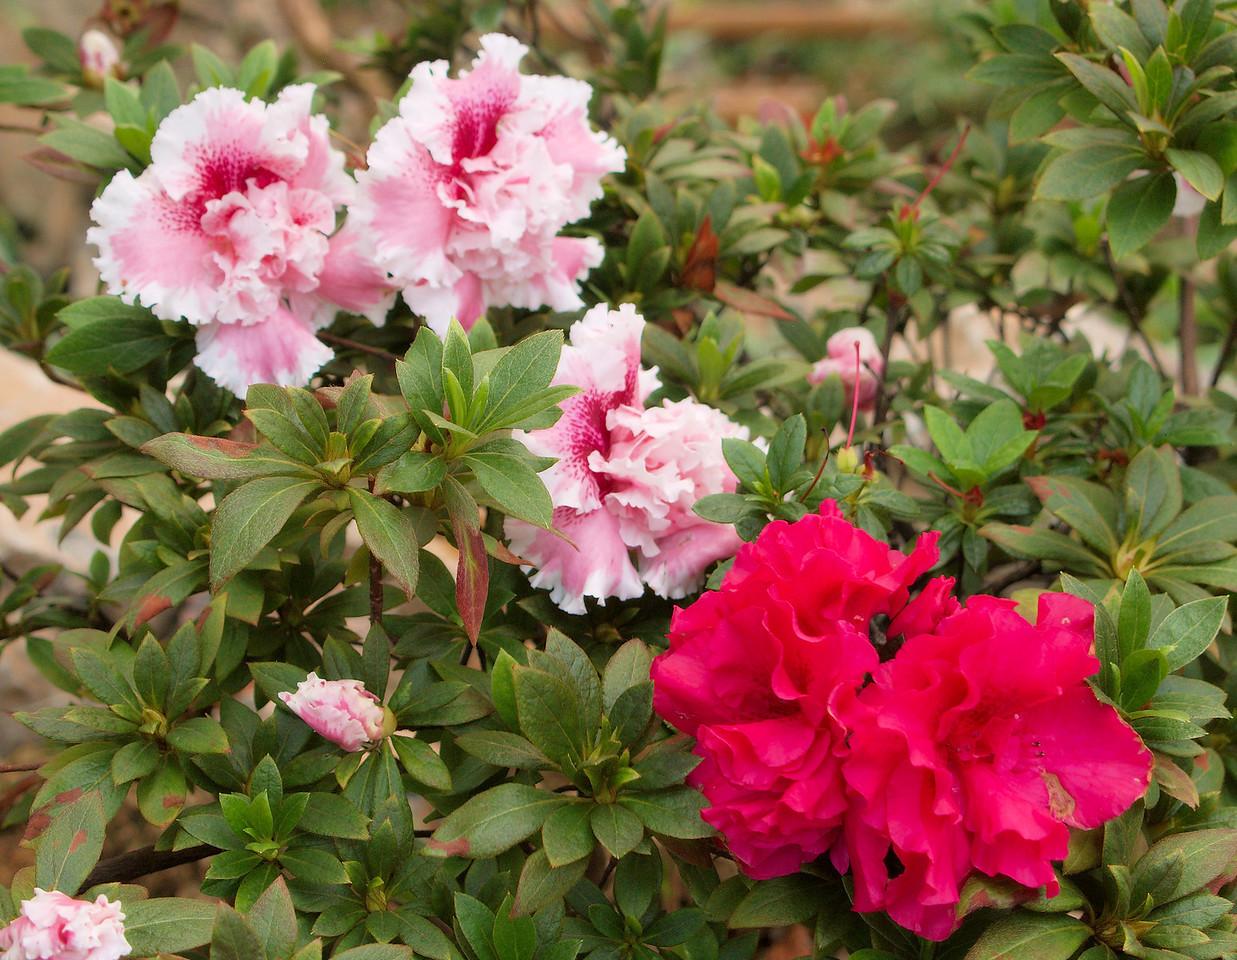 20090901_3187 alpine house flowers